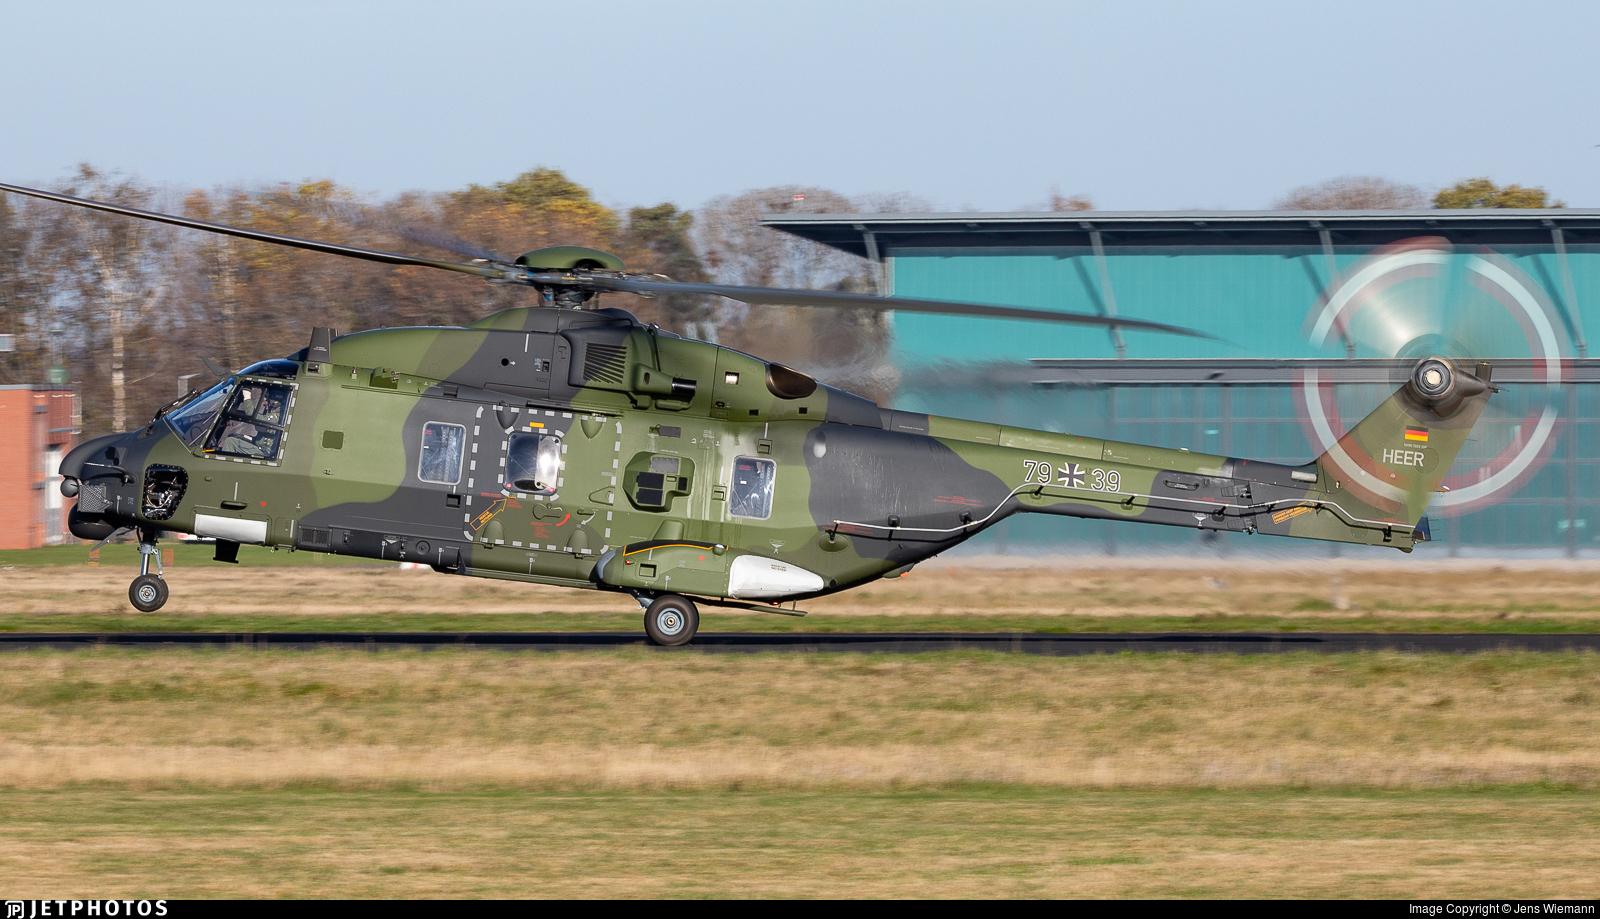 79-39 - NH Industries NH-90TTH - Germany - Army